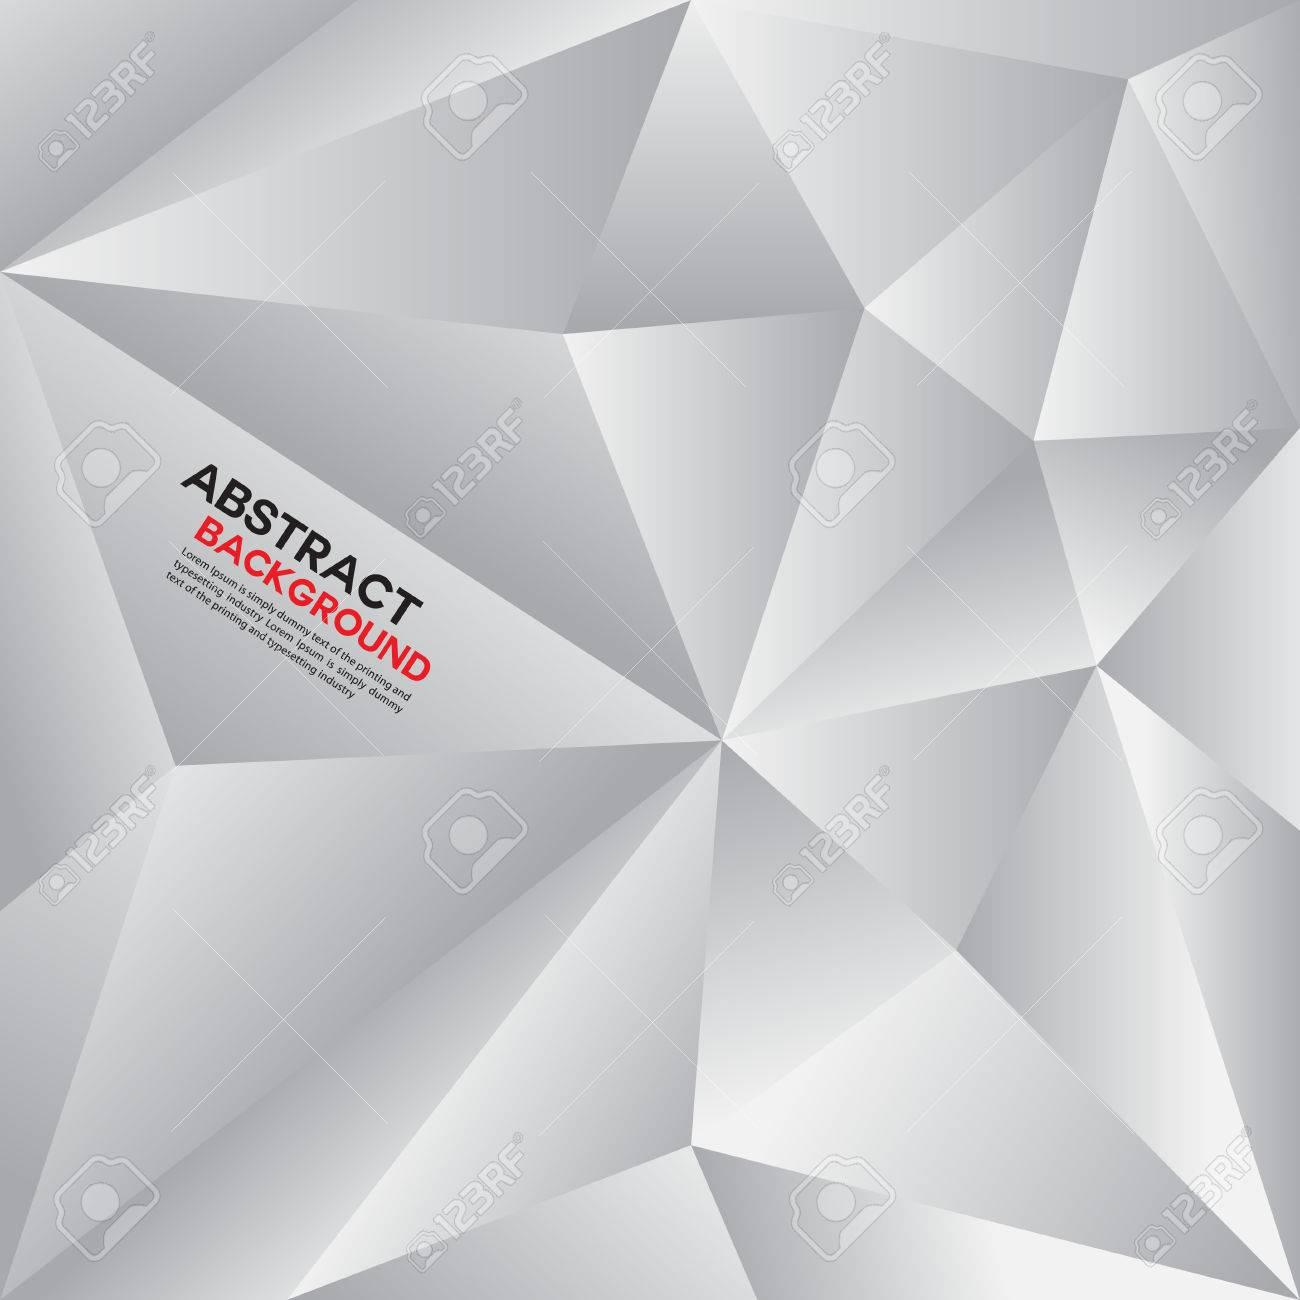 Silver Polygon BackgroundAbstract Geometrical BackgroundVector Illustration Creative Design Templatescover